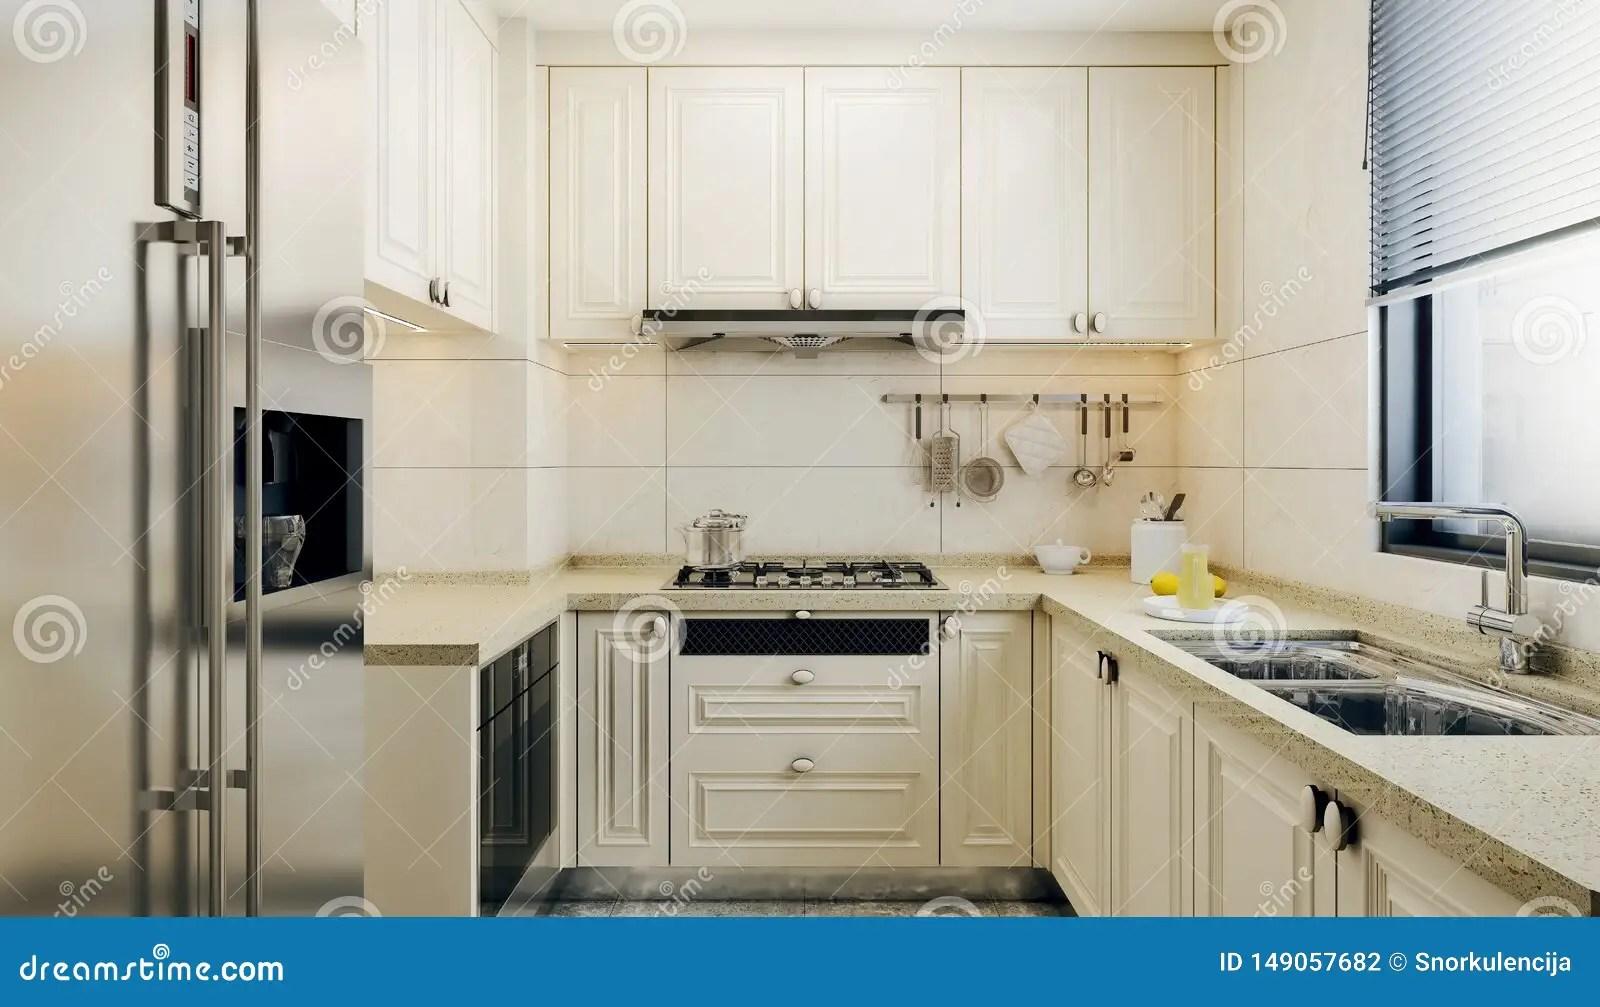 https www dreamstime com modern interior design small kitchen bright colored kitchen elements beige tiles window above sink modern interior image149057682